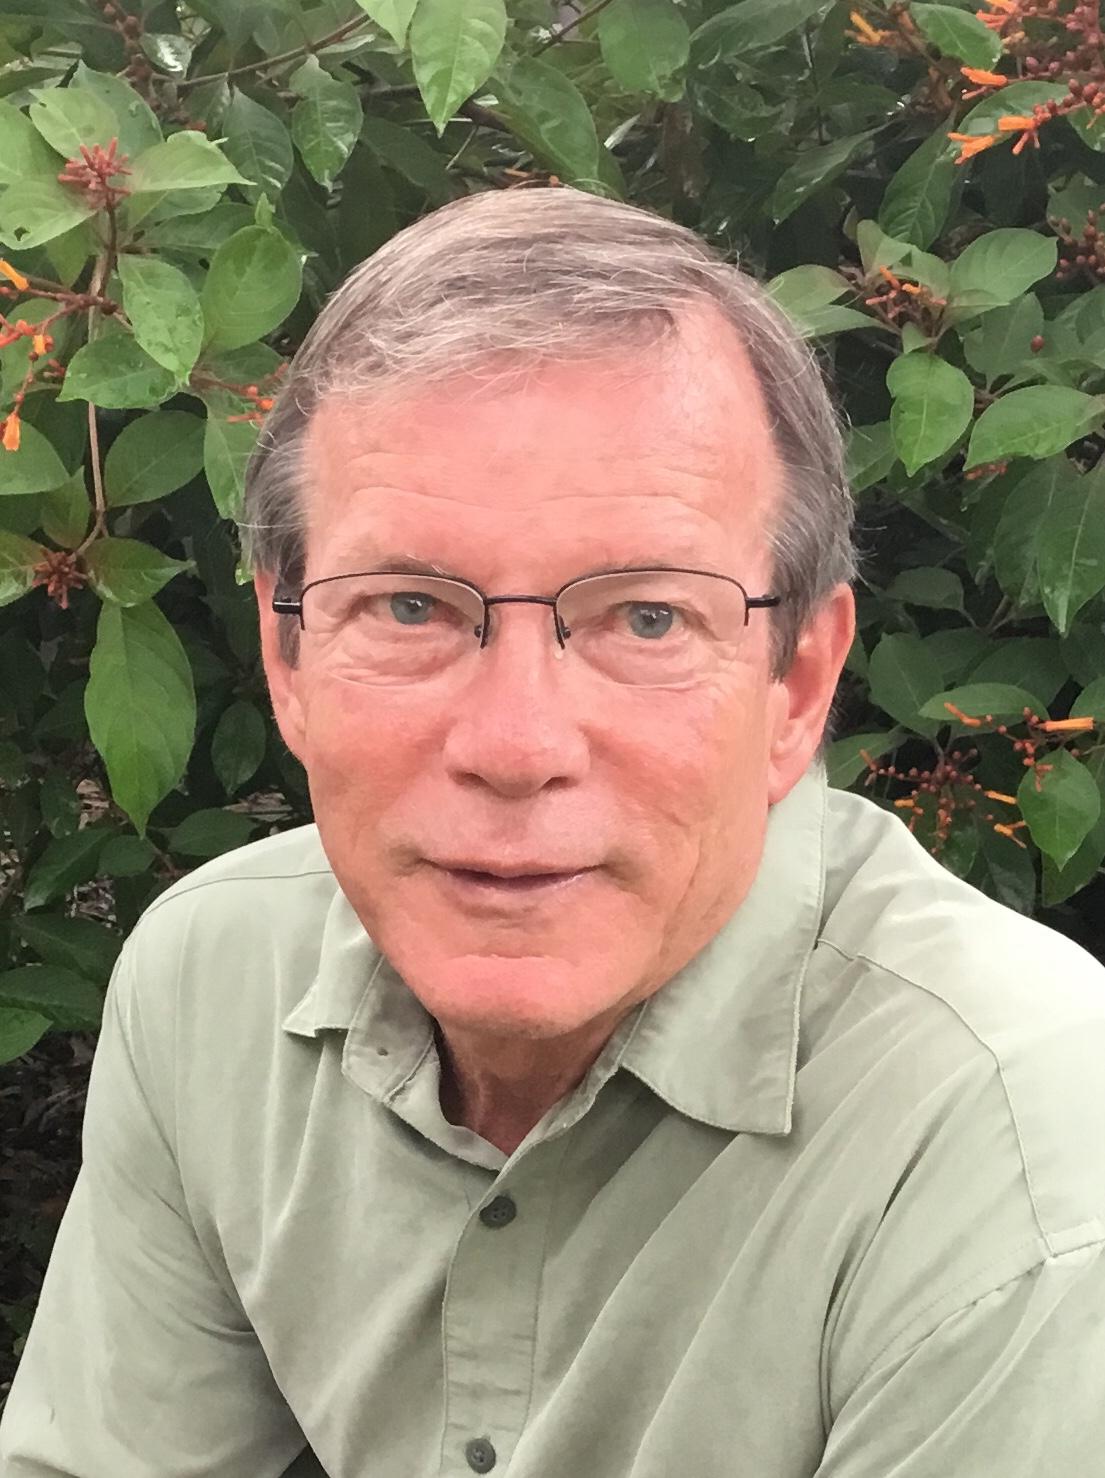 Michael Duffy, Vice President, Programs